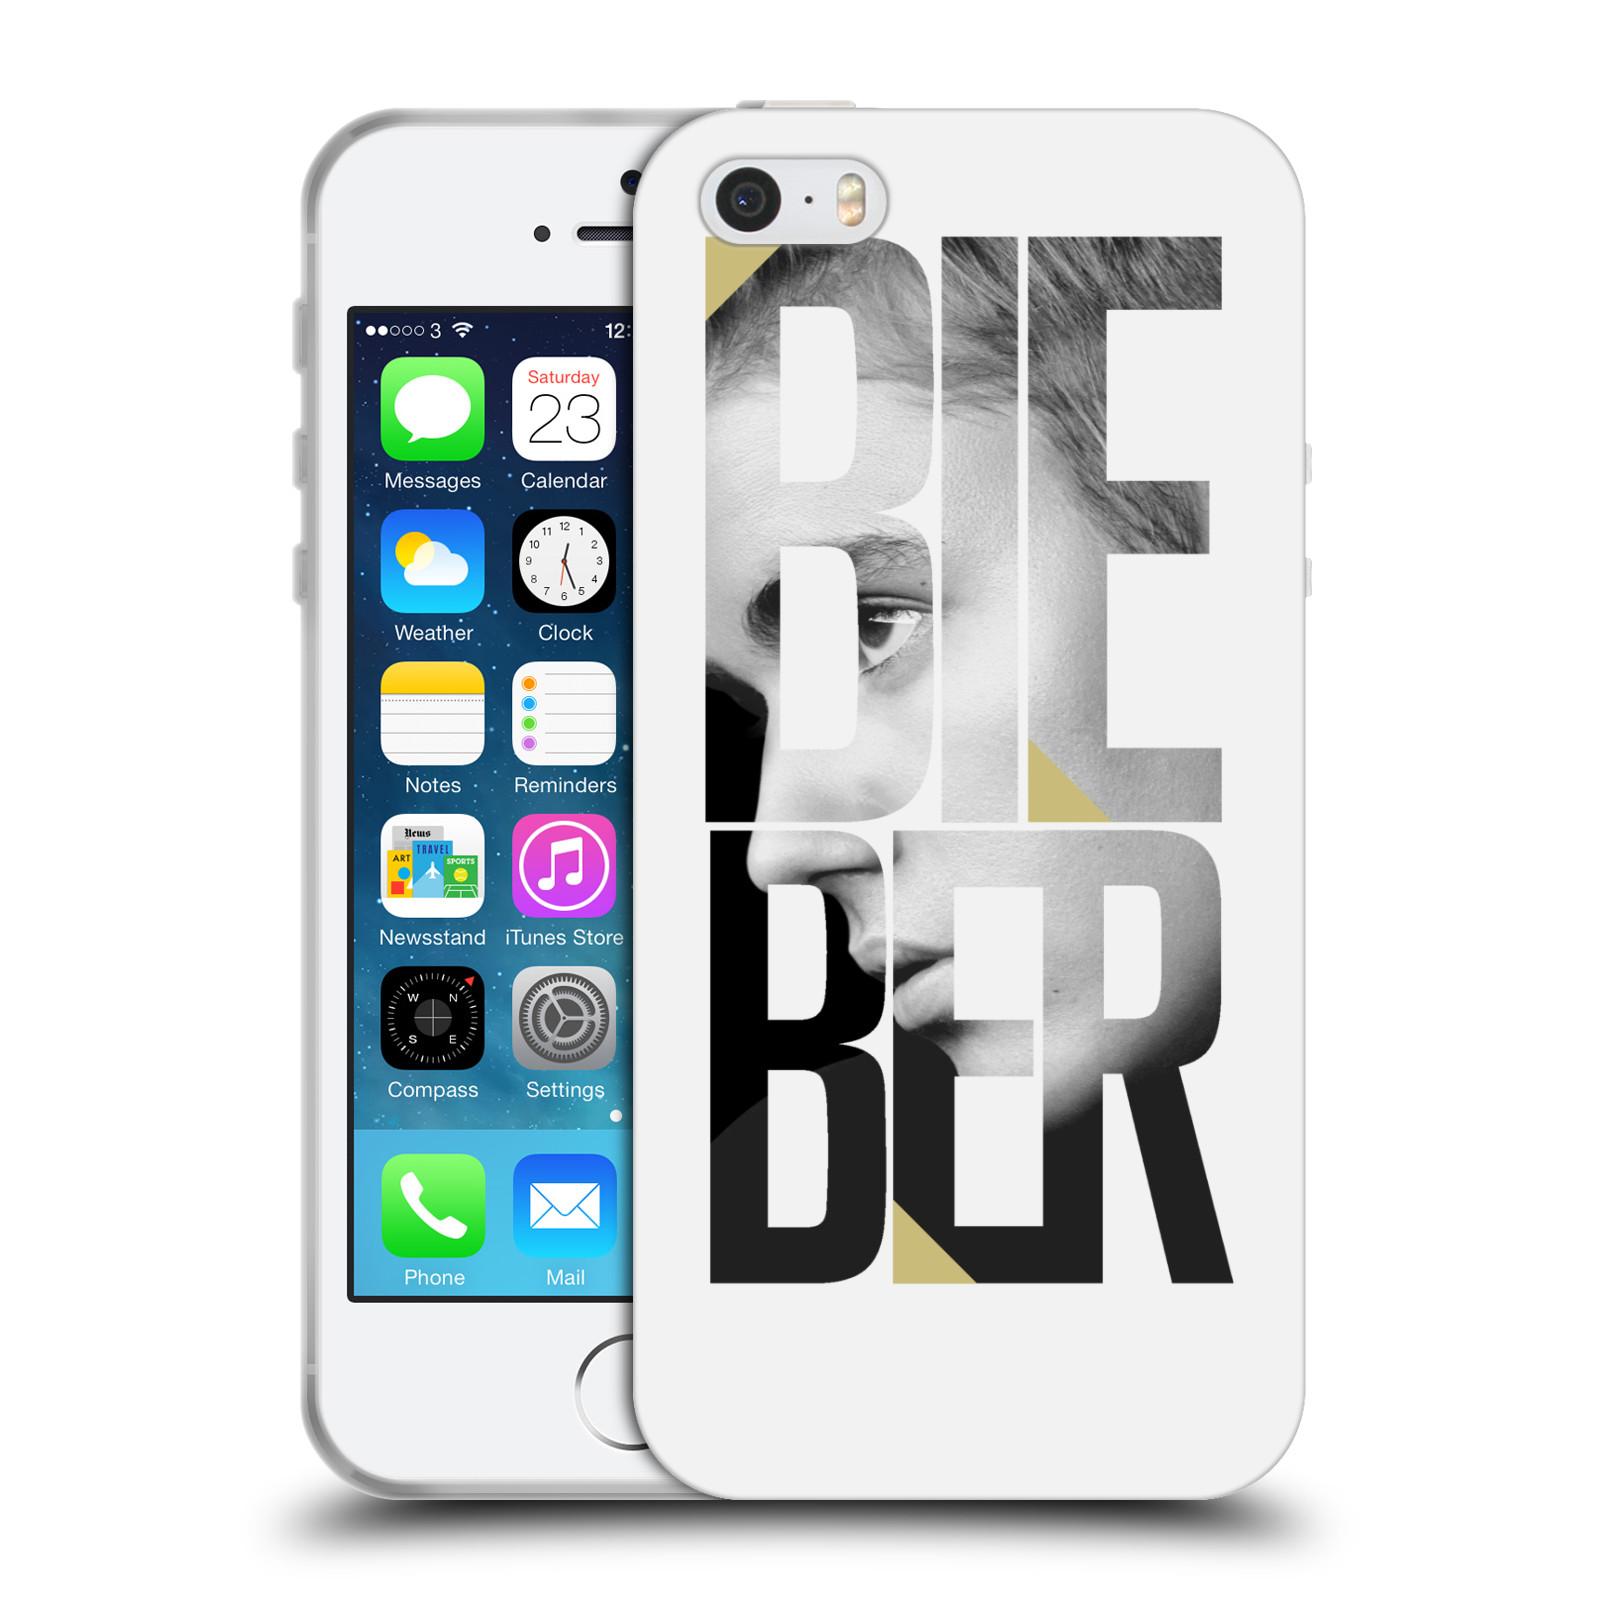 HEAD CASE silikonový obal na mobil Apple Iphone 5 / 5S originální potisk Justin Bieber nadpis fotka